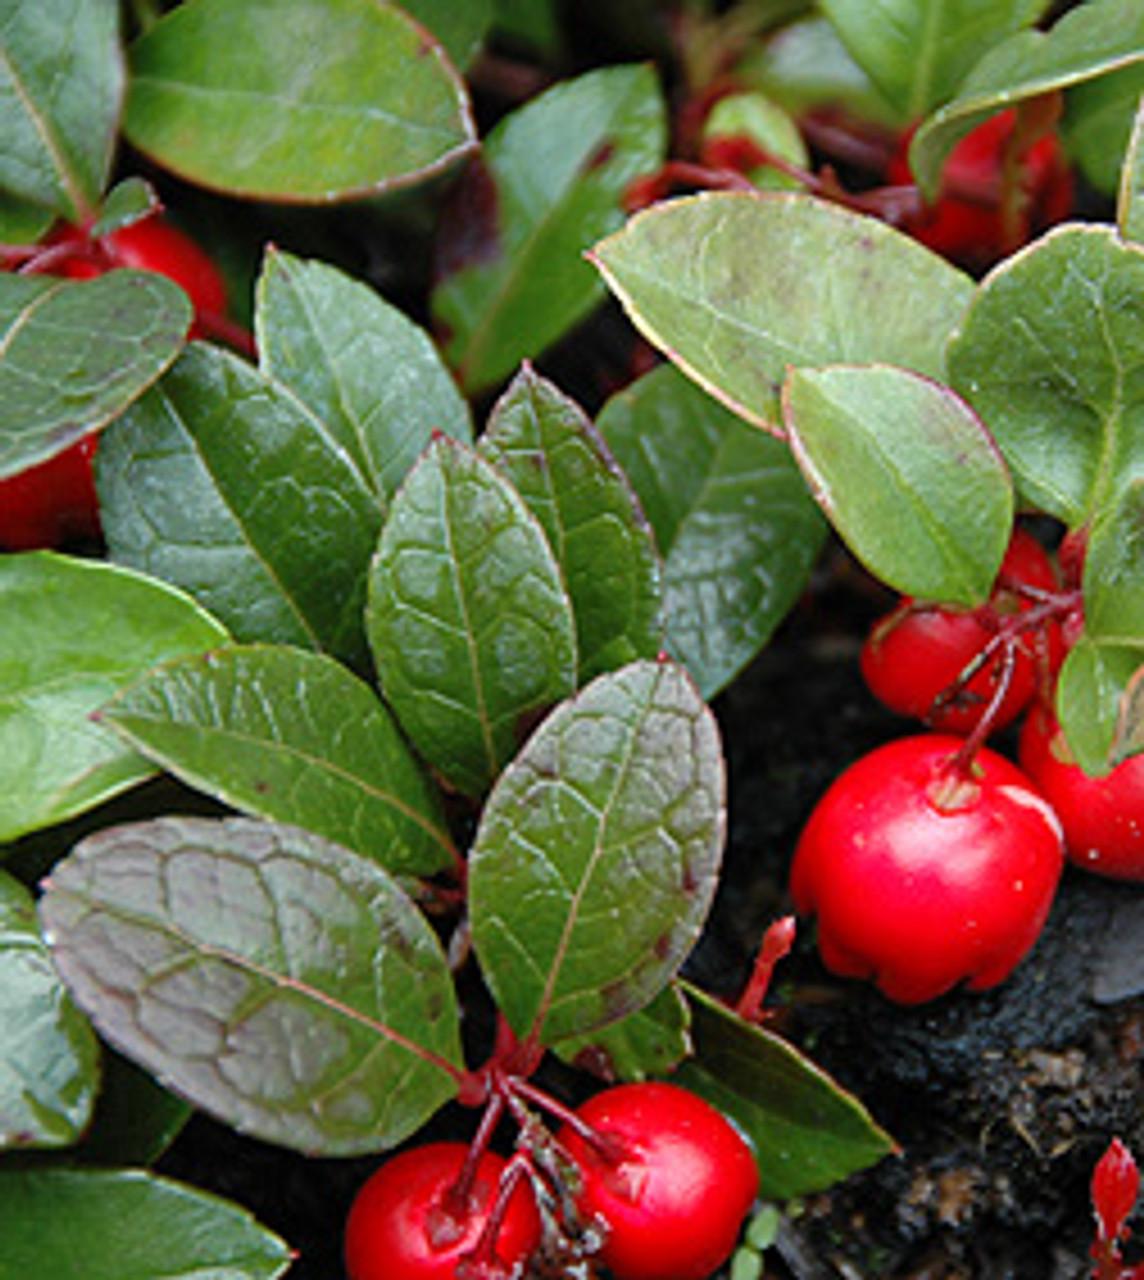 Wintergreen - Gaultheria procumbens